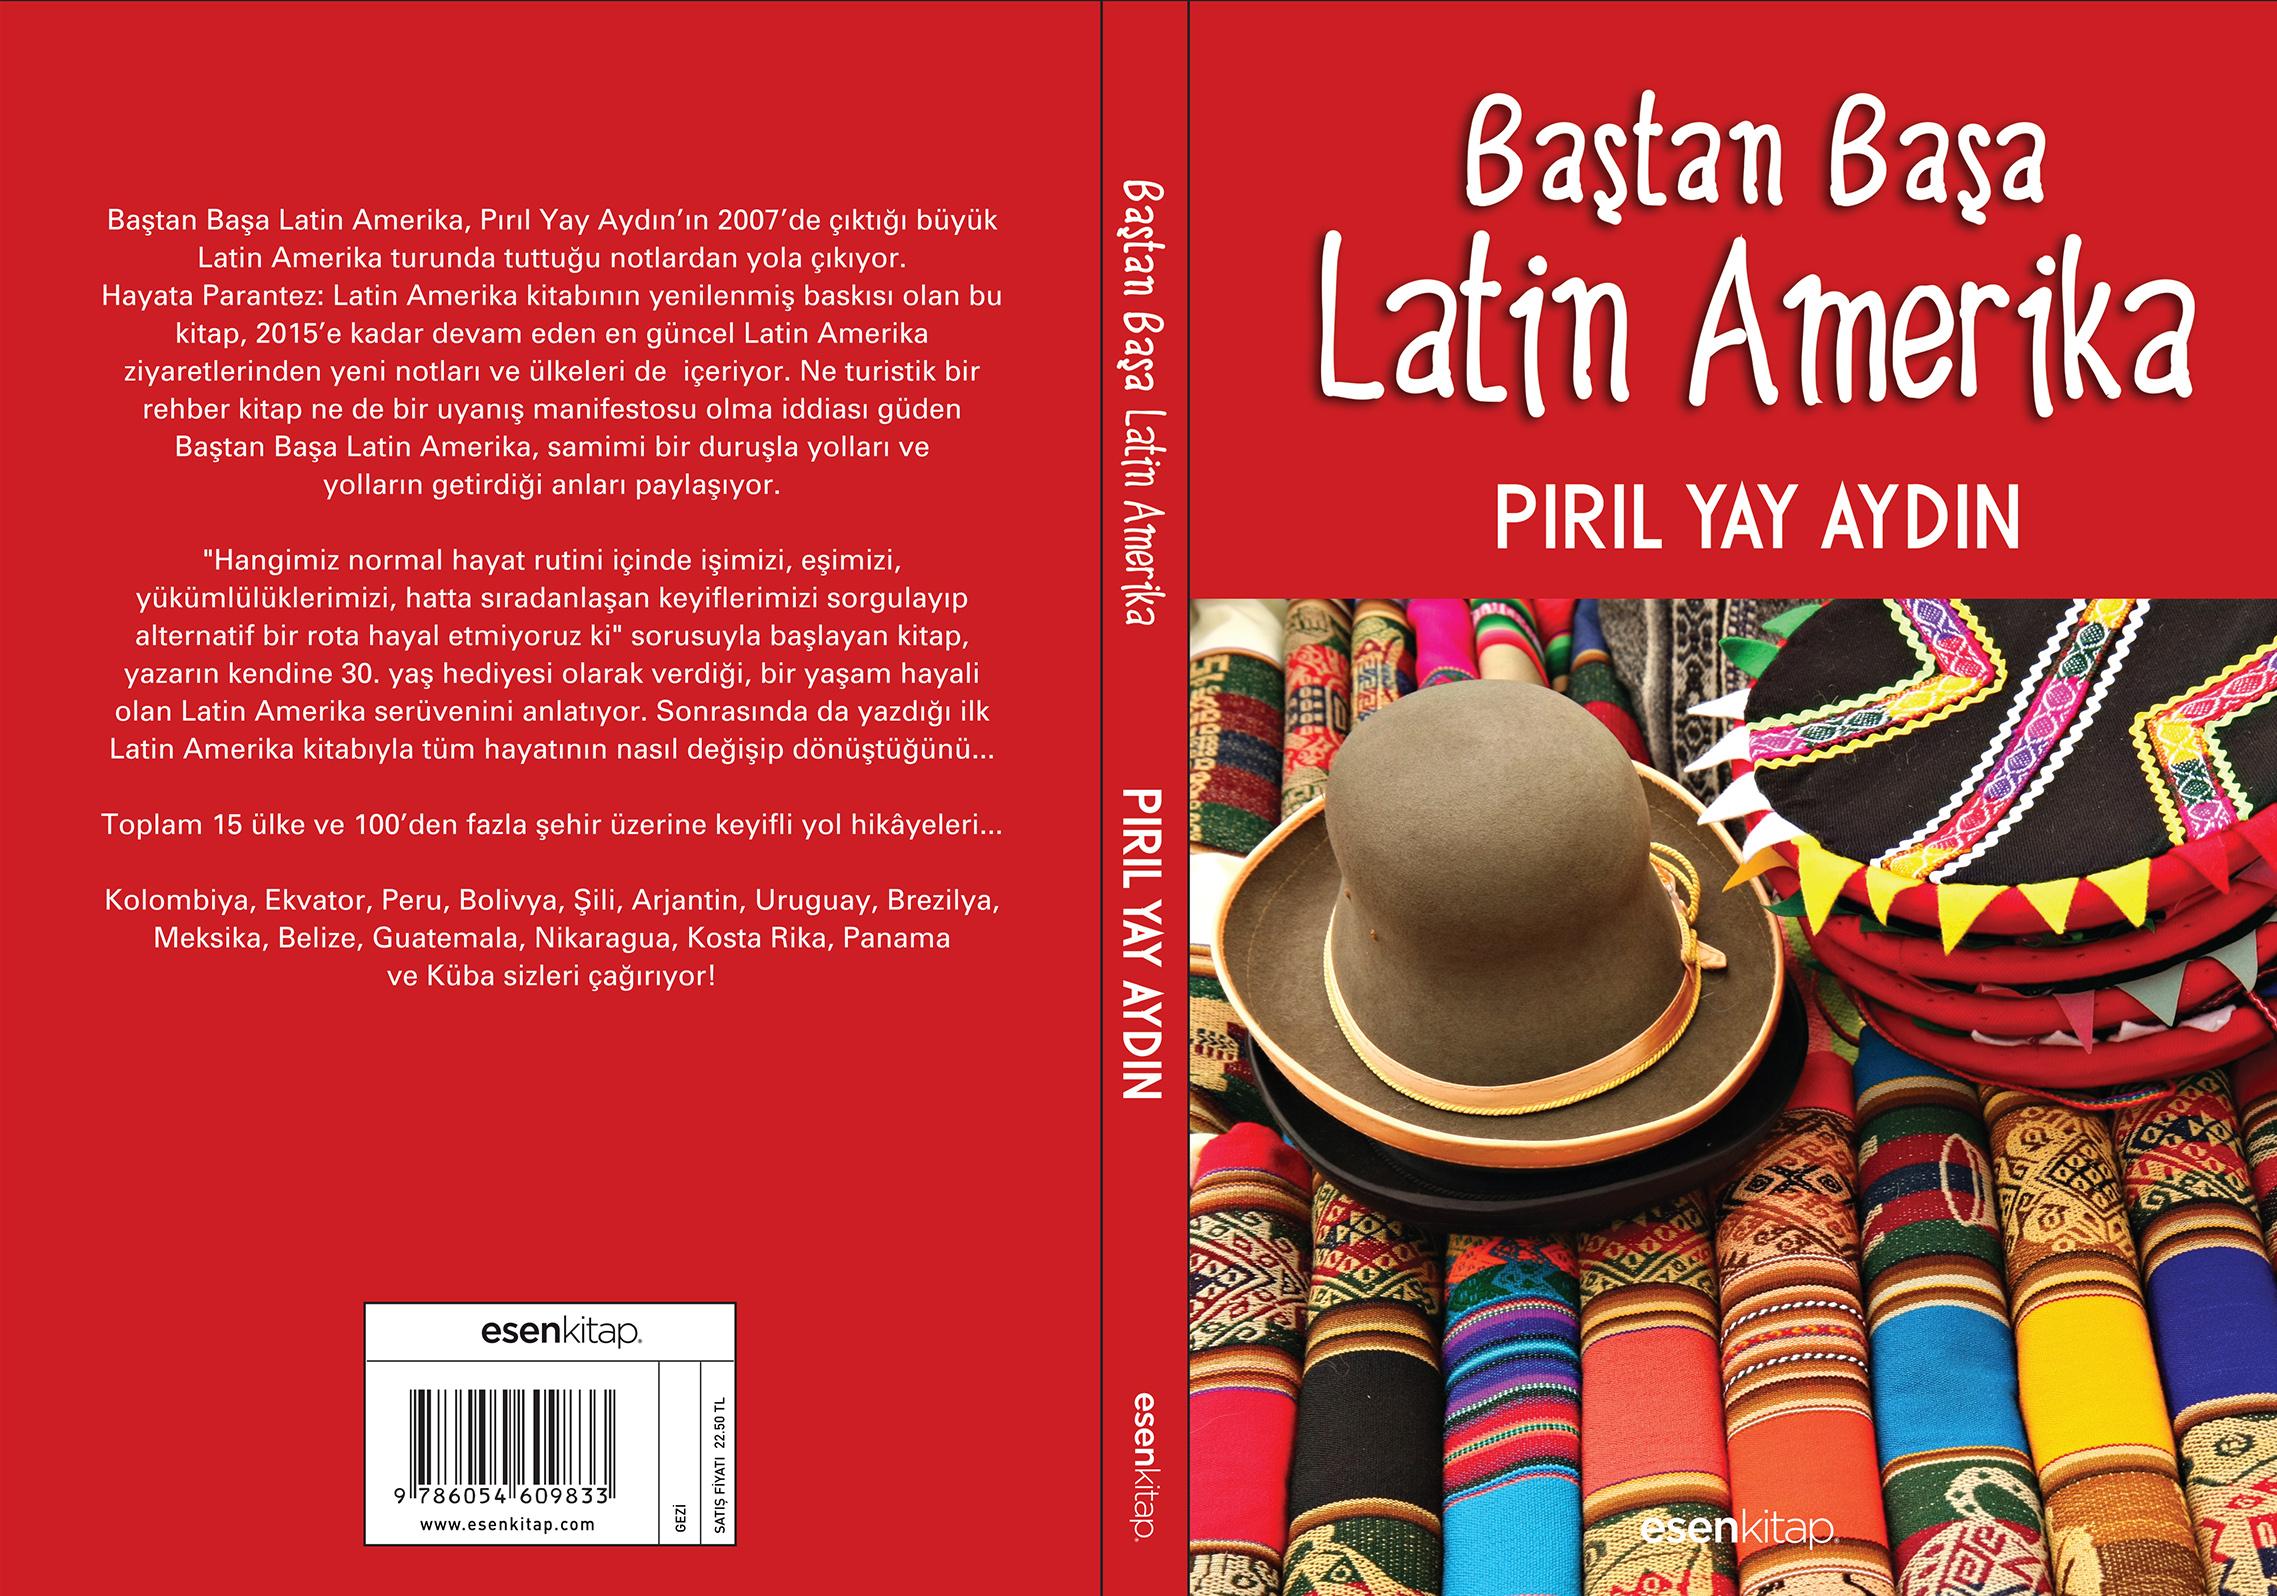 LATIN-AMERIKA-SALI